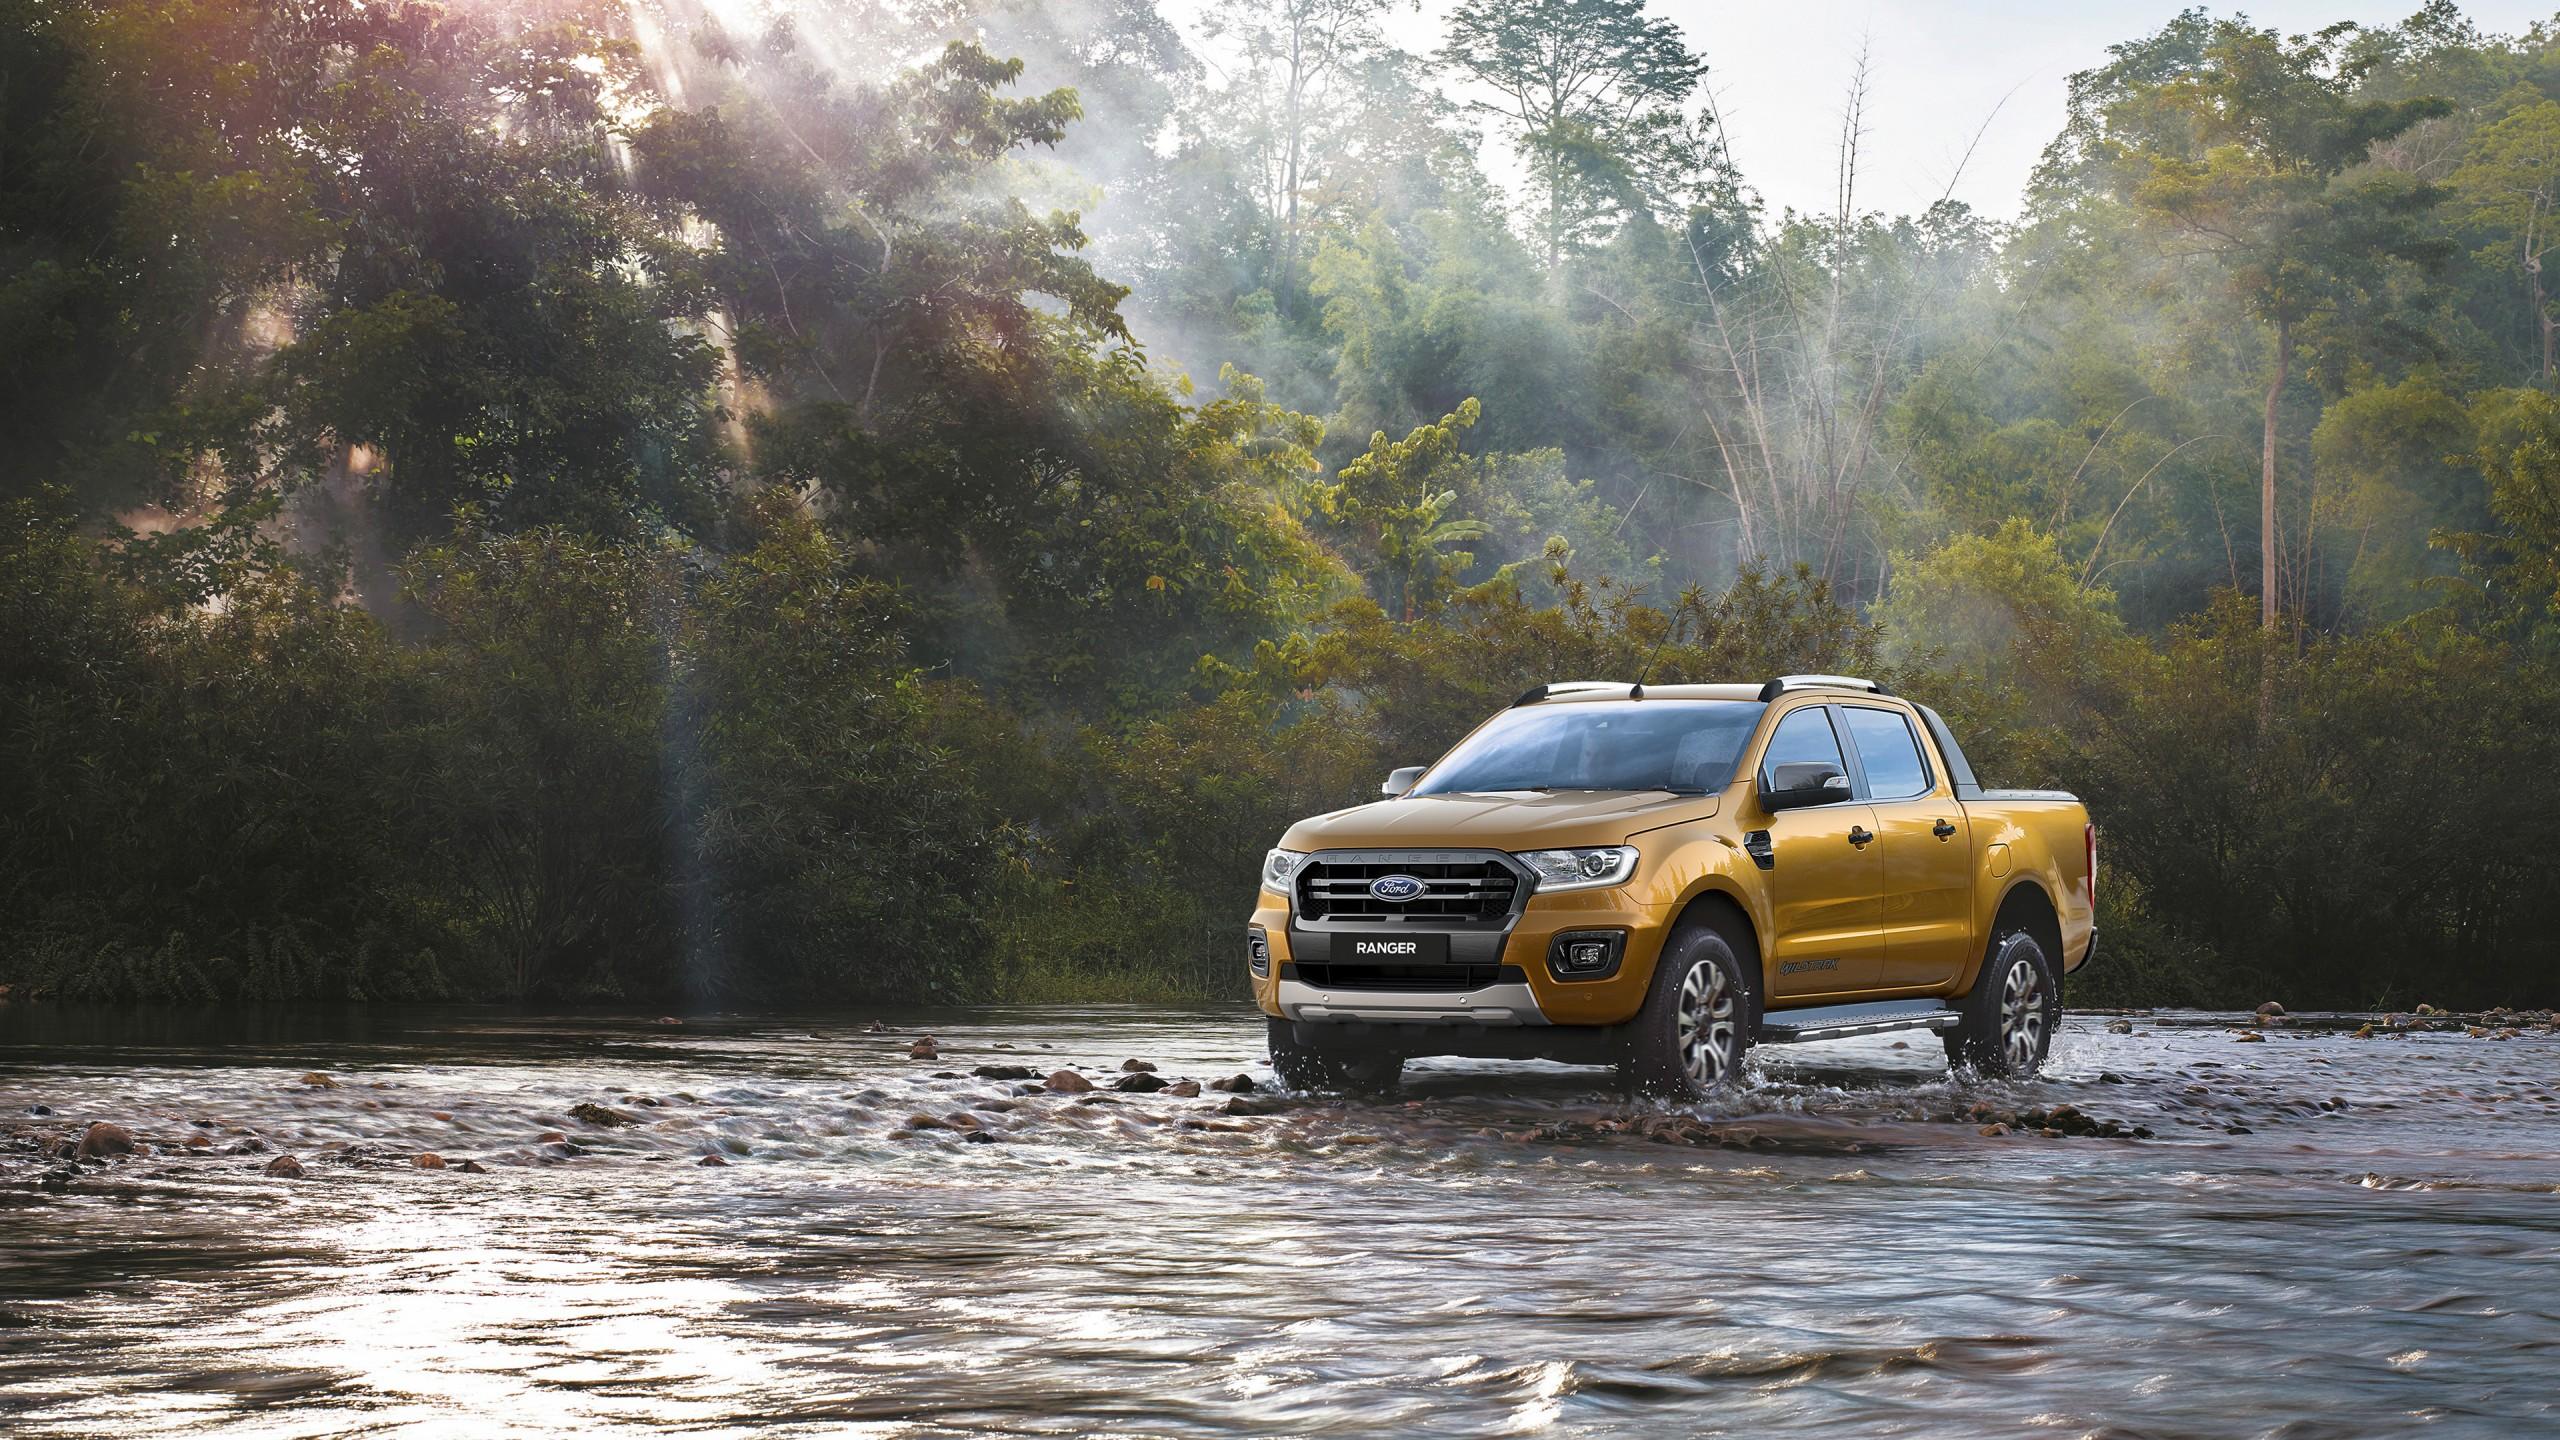 2018 Ford Ranger Wildtrak 4K Wallpaper | HD Car Wallpapers ...